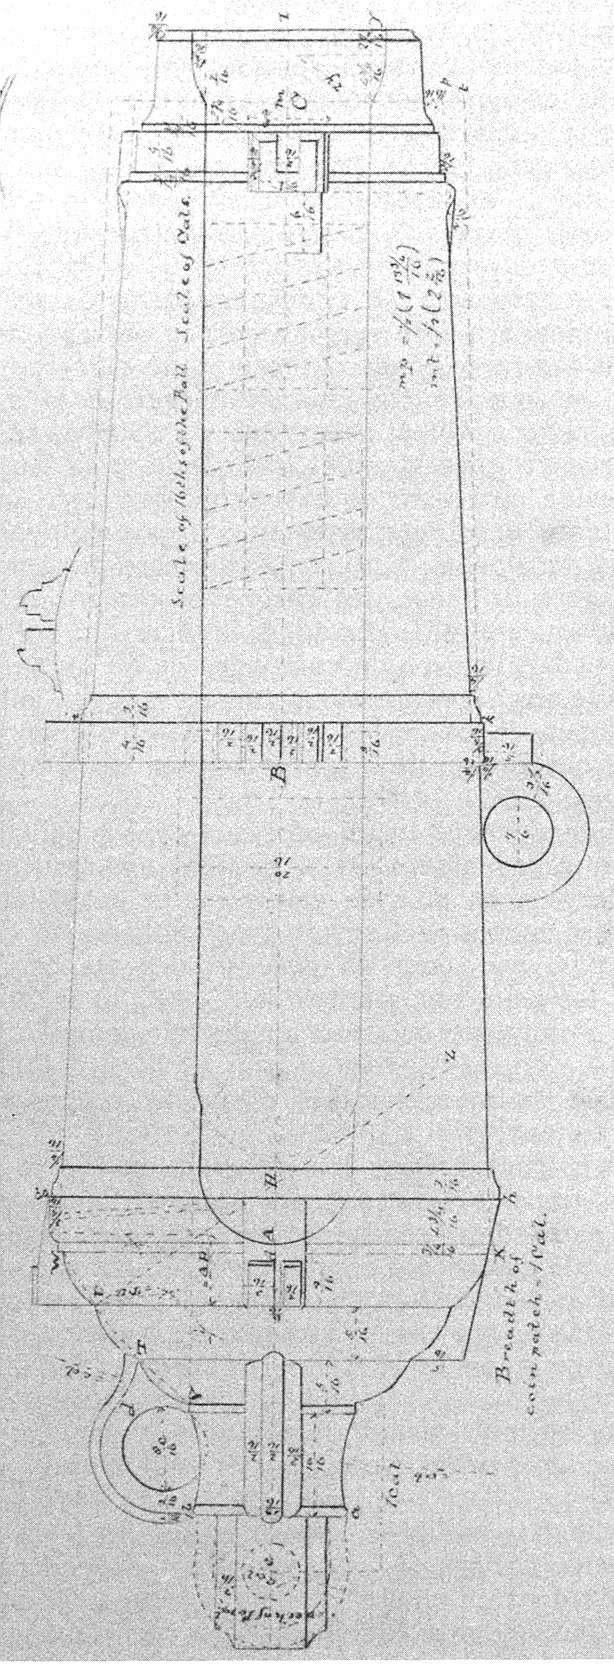 Caronade et mortier (projet de construction) - Page 4 Corona10